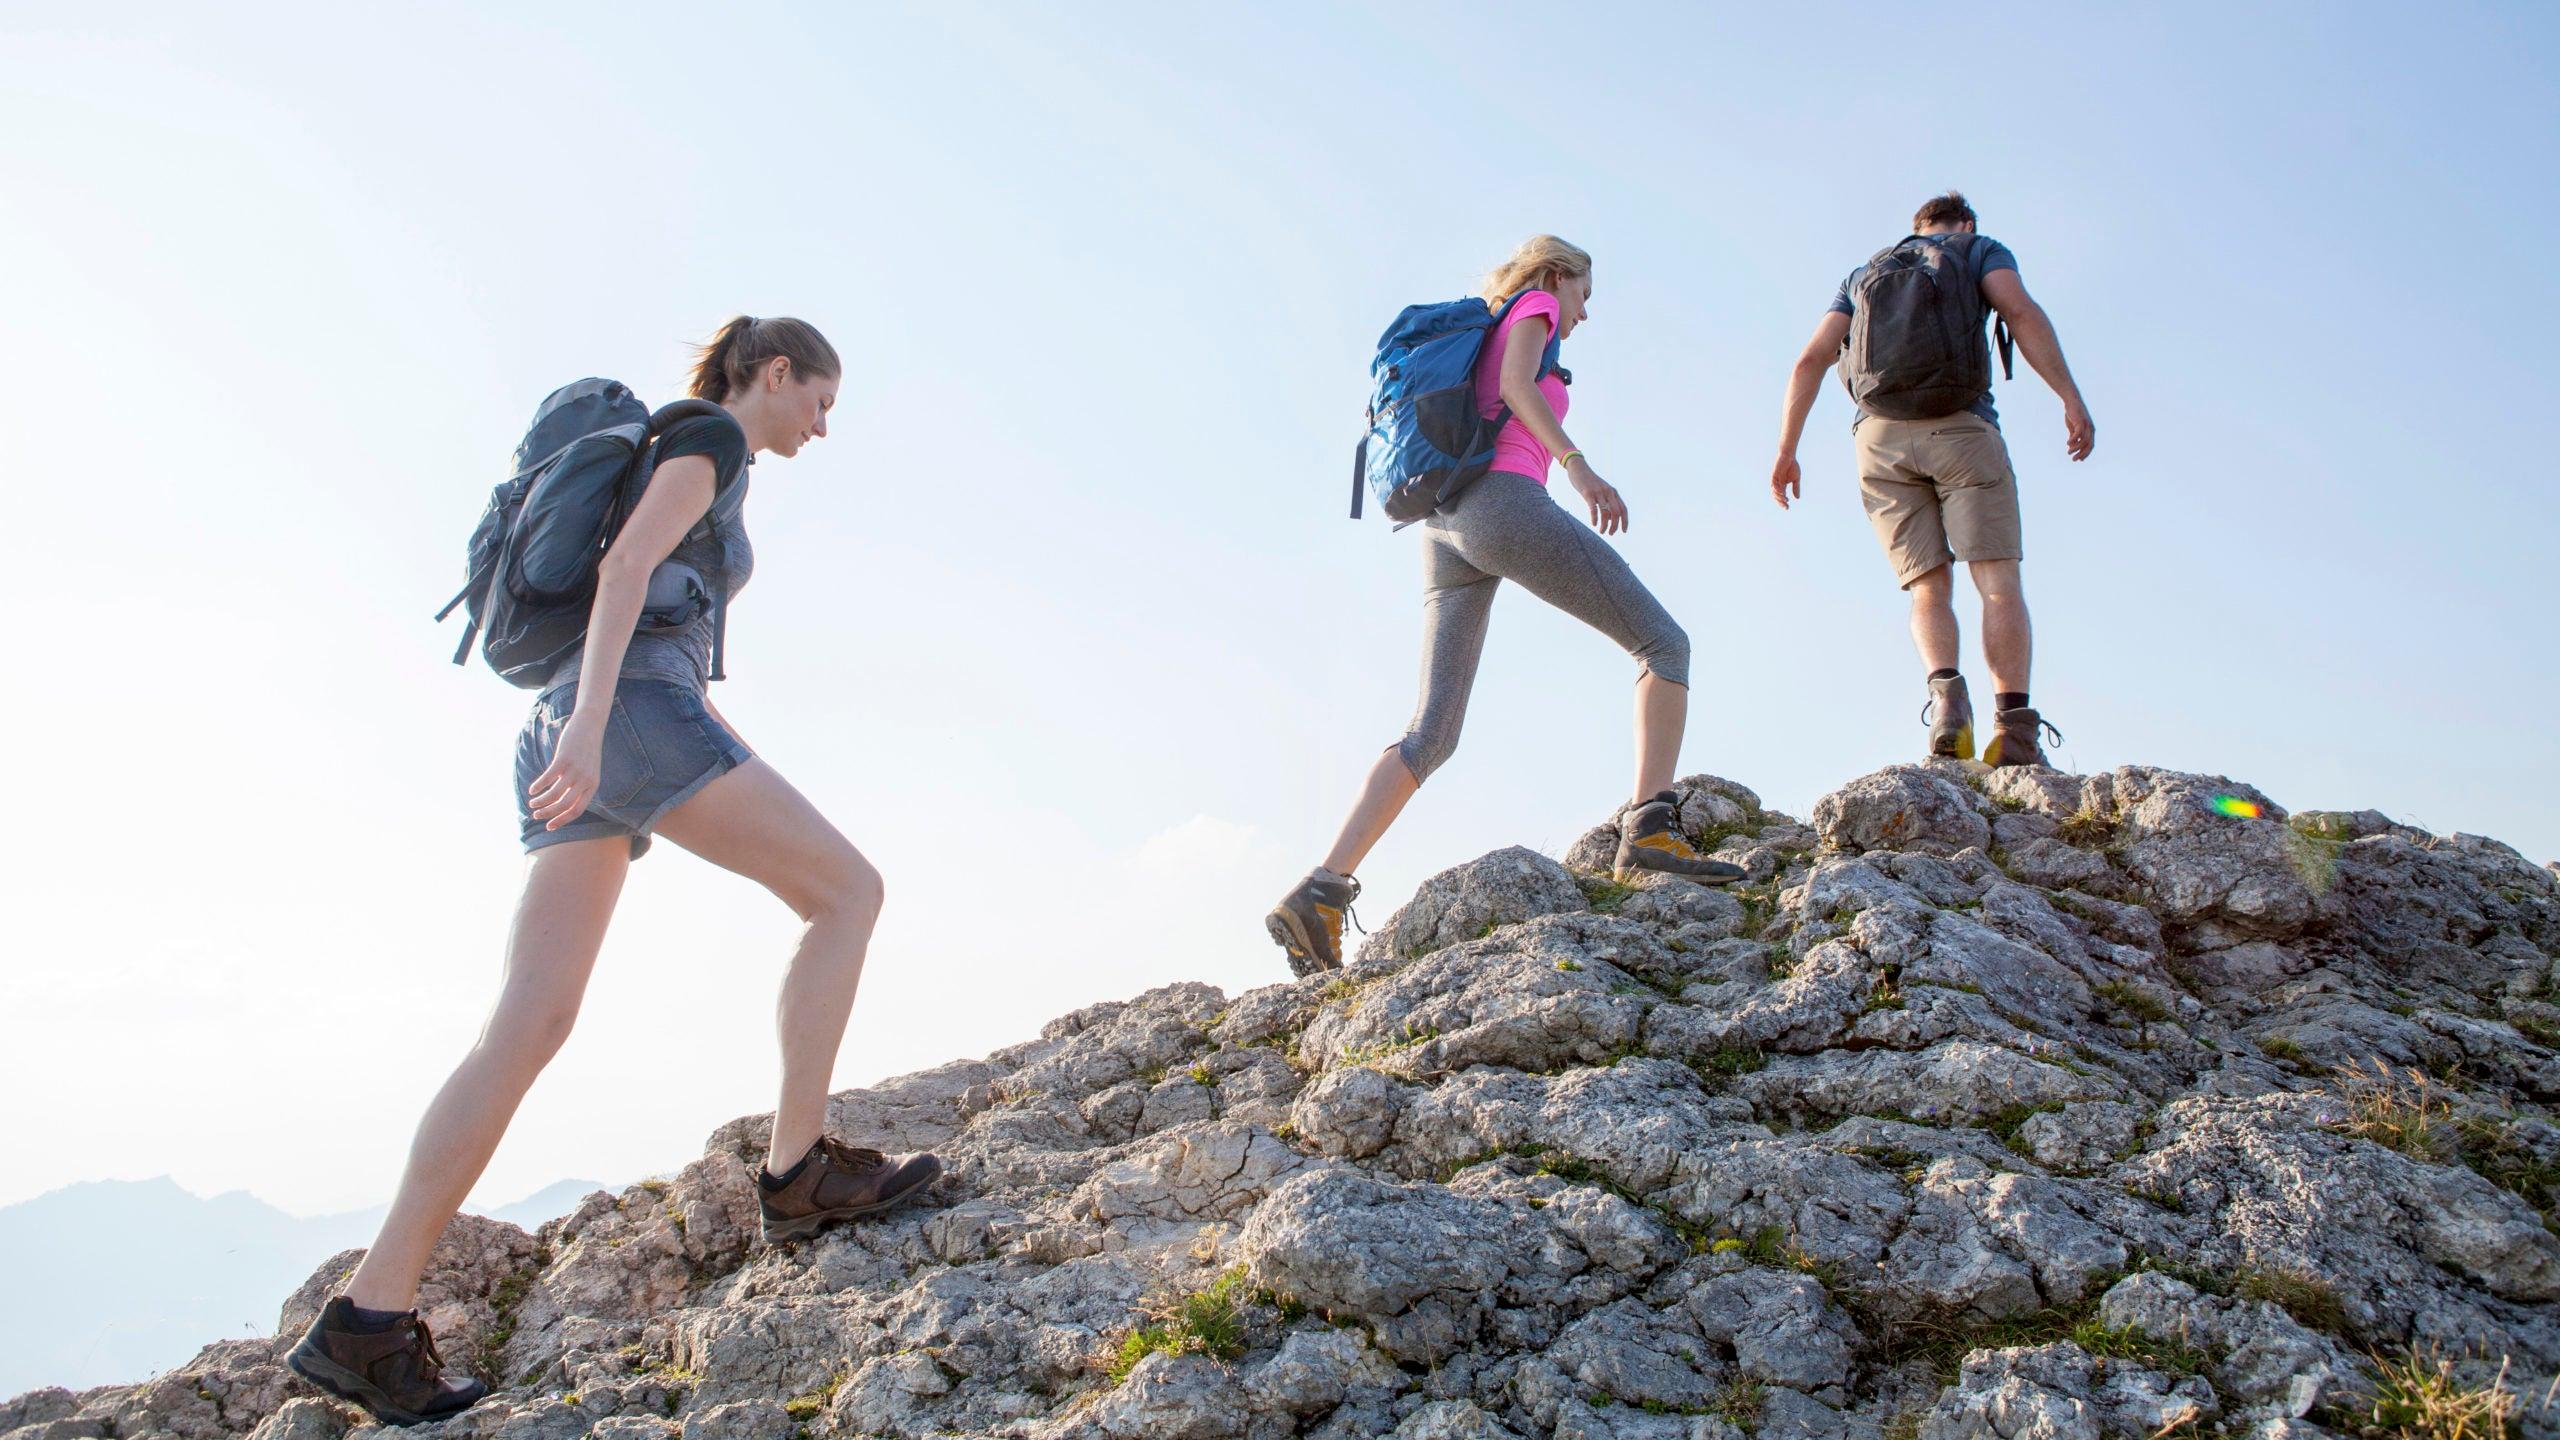 variable terrain while hiking